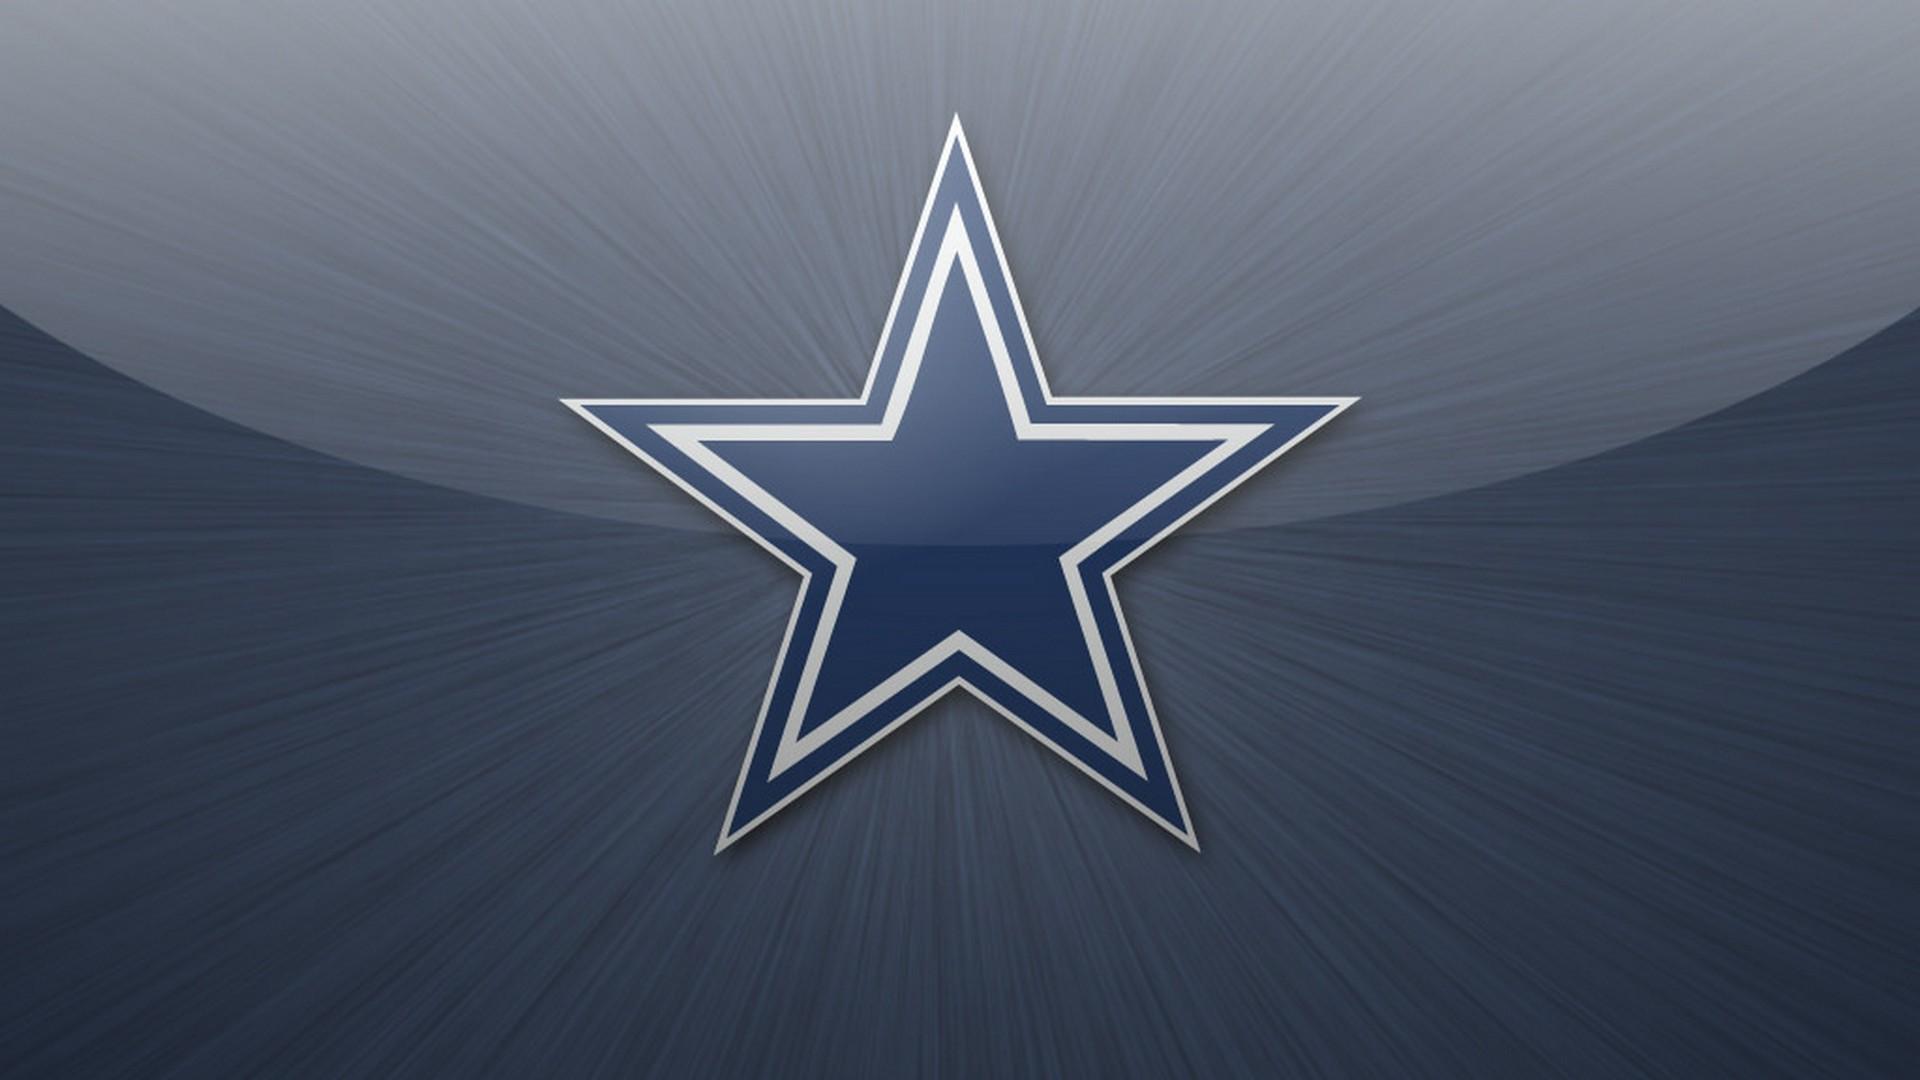 dallas cowboys star wallpaper 68604